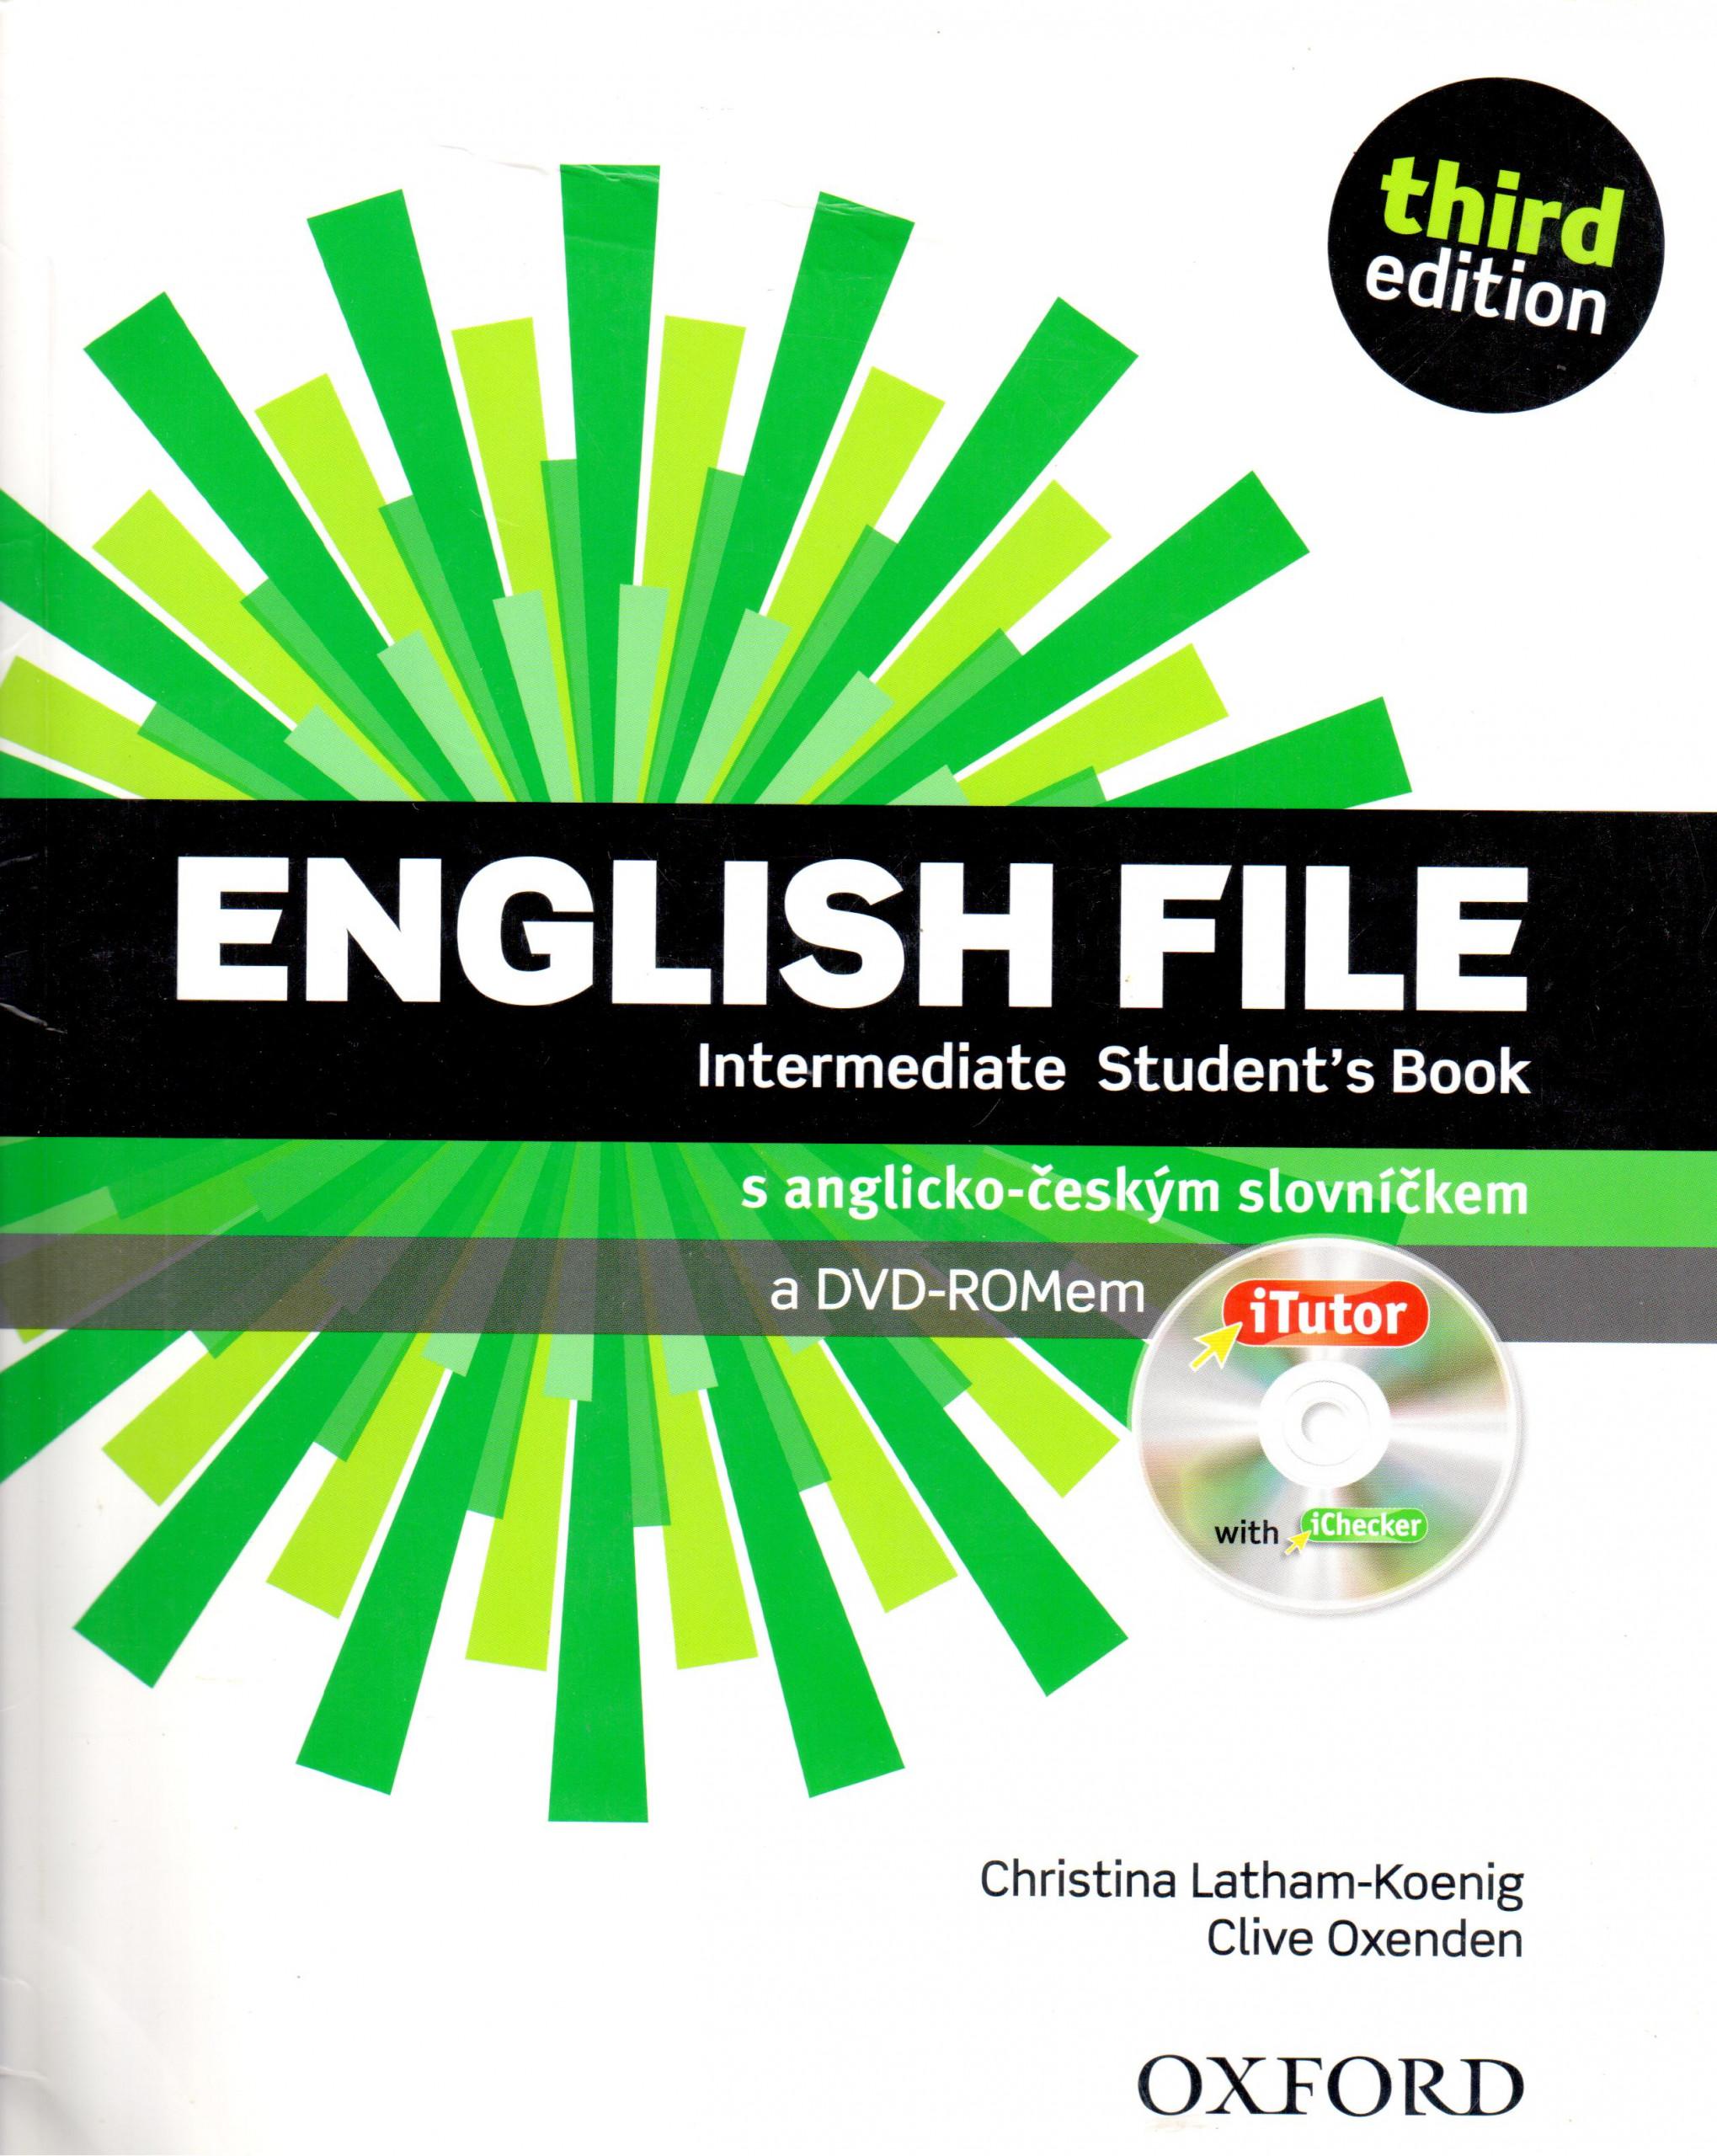 English File: Intermediate Student's Book (3rd edition) - Náhled učebnice